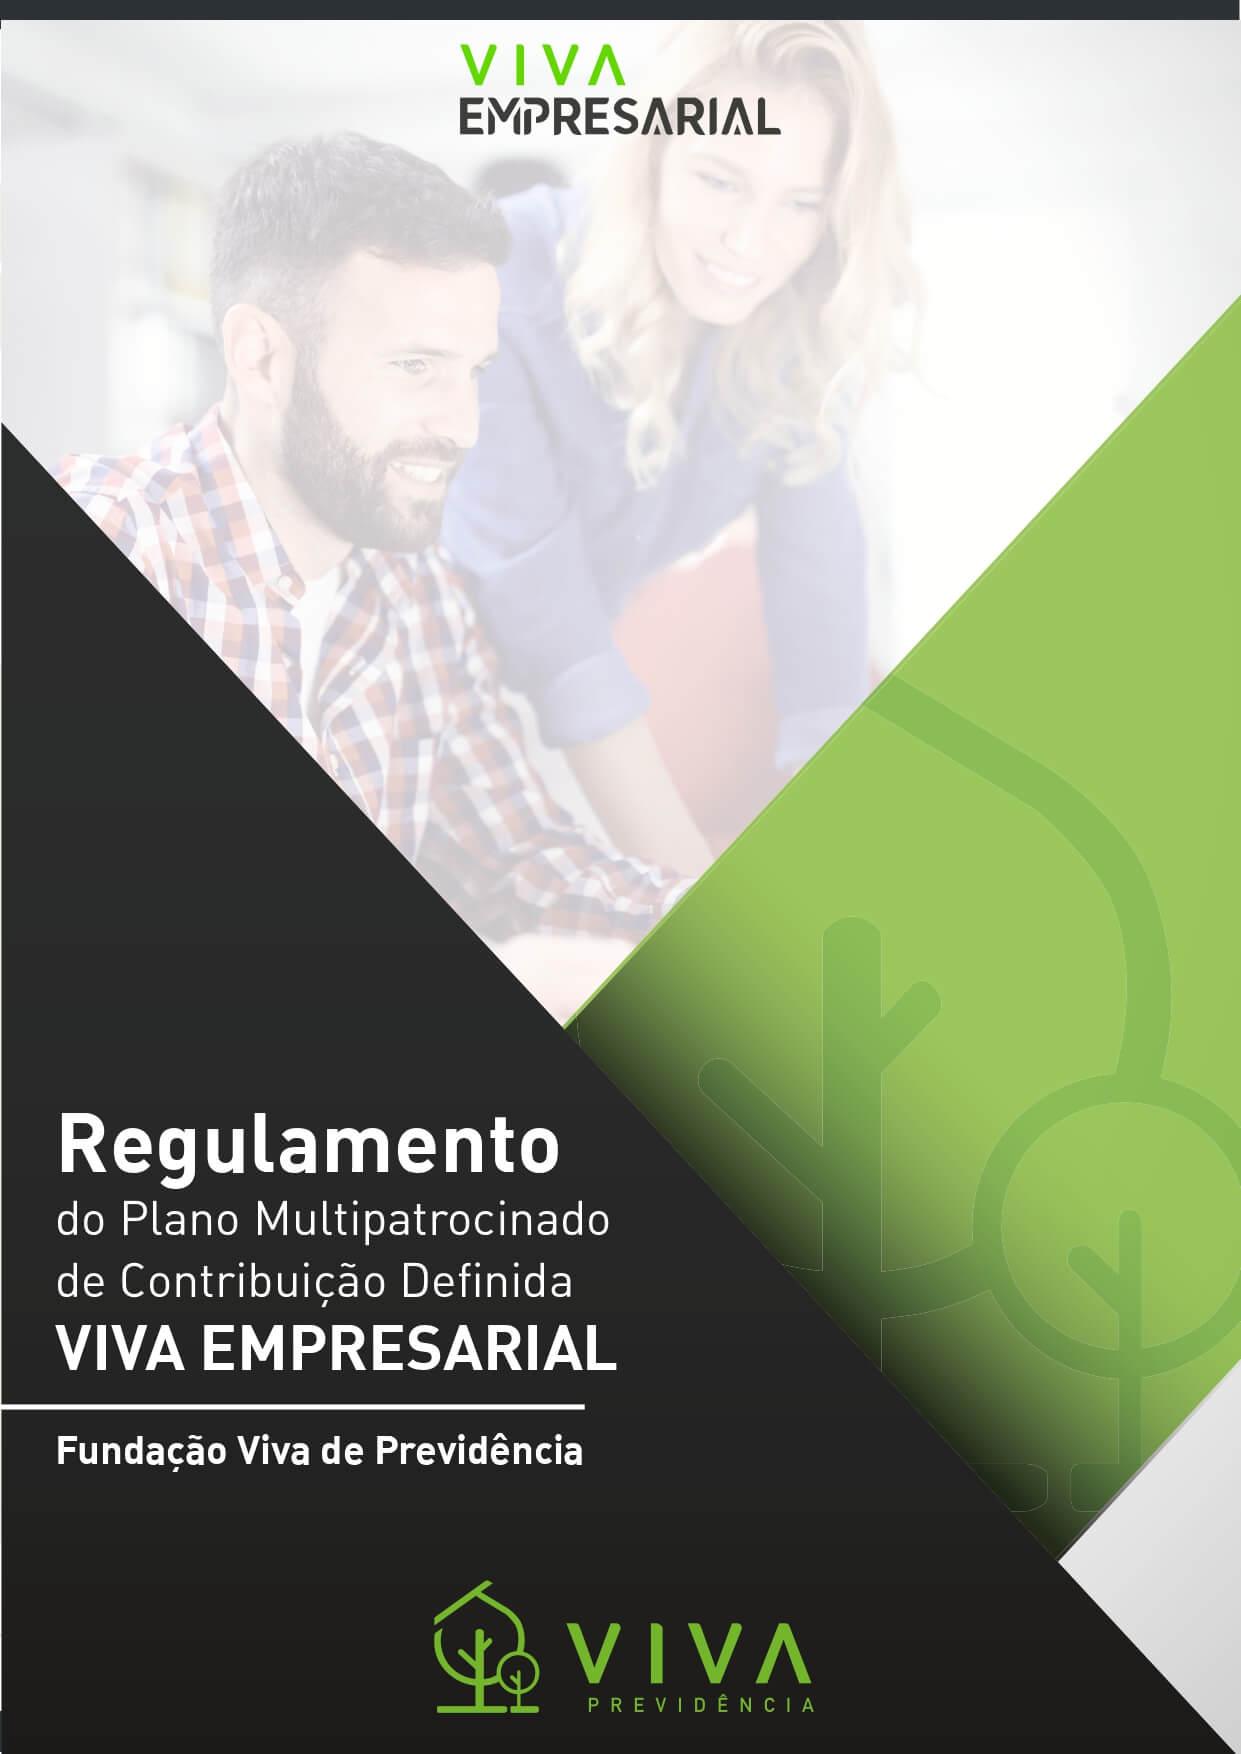 Regulamento Viva Empresarial